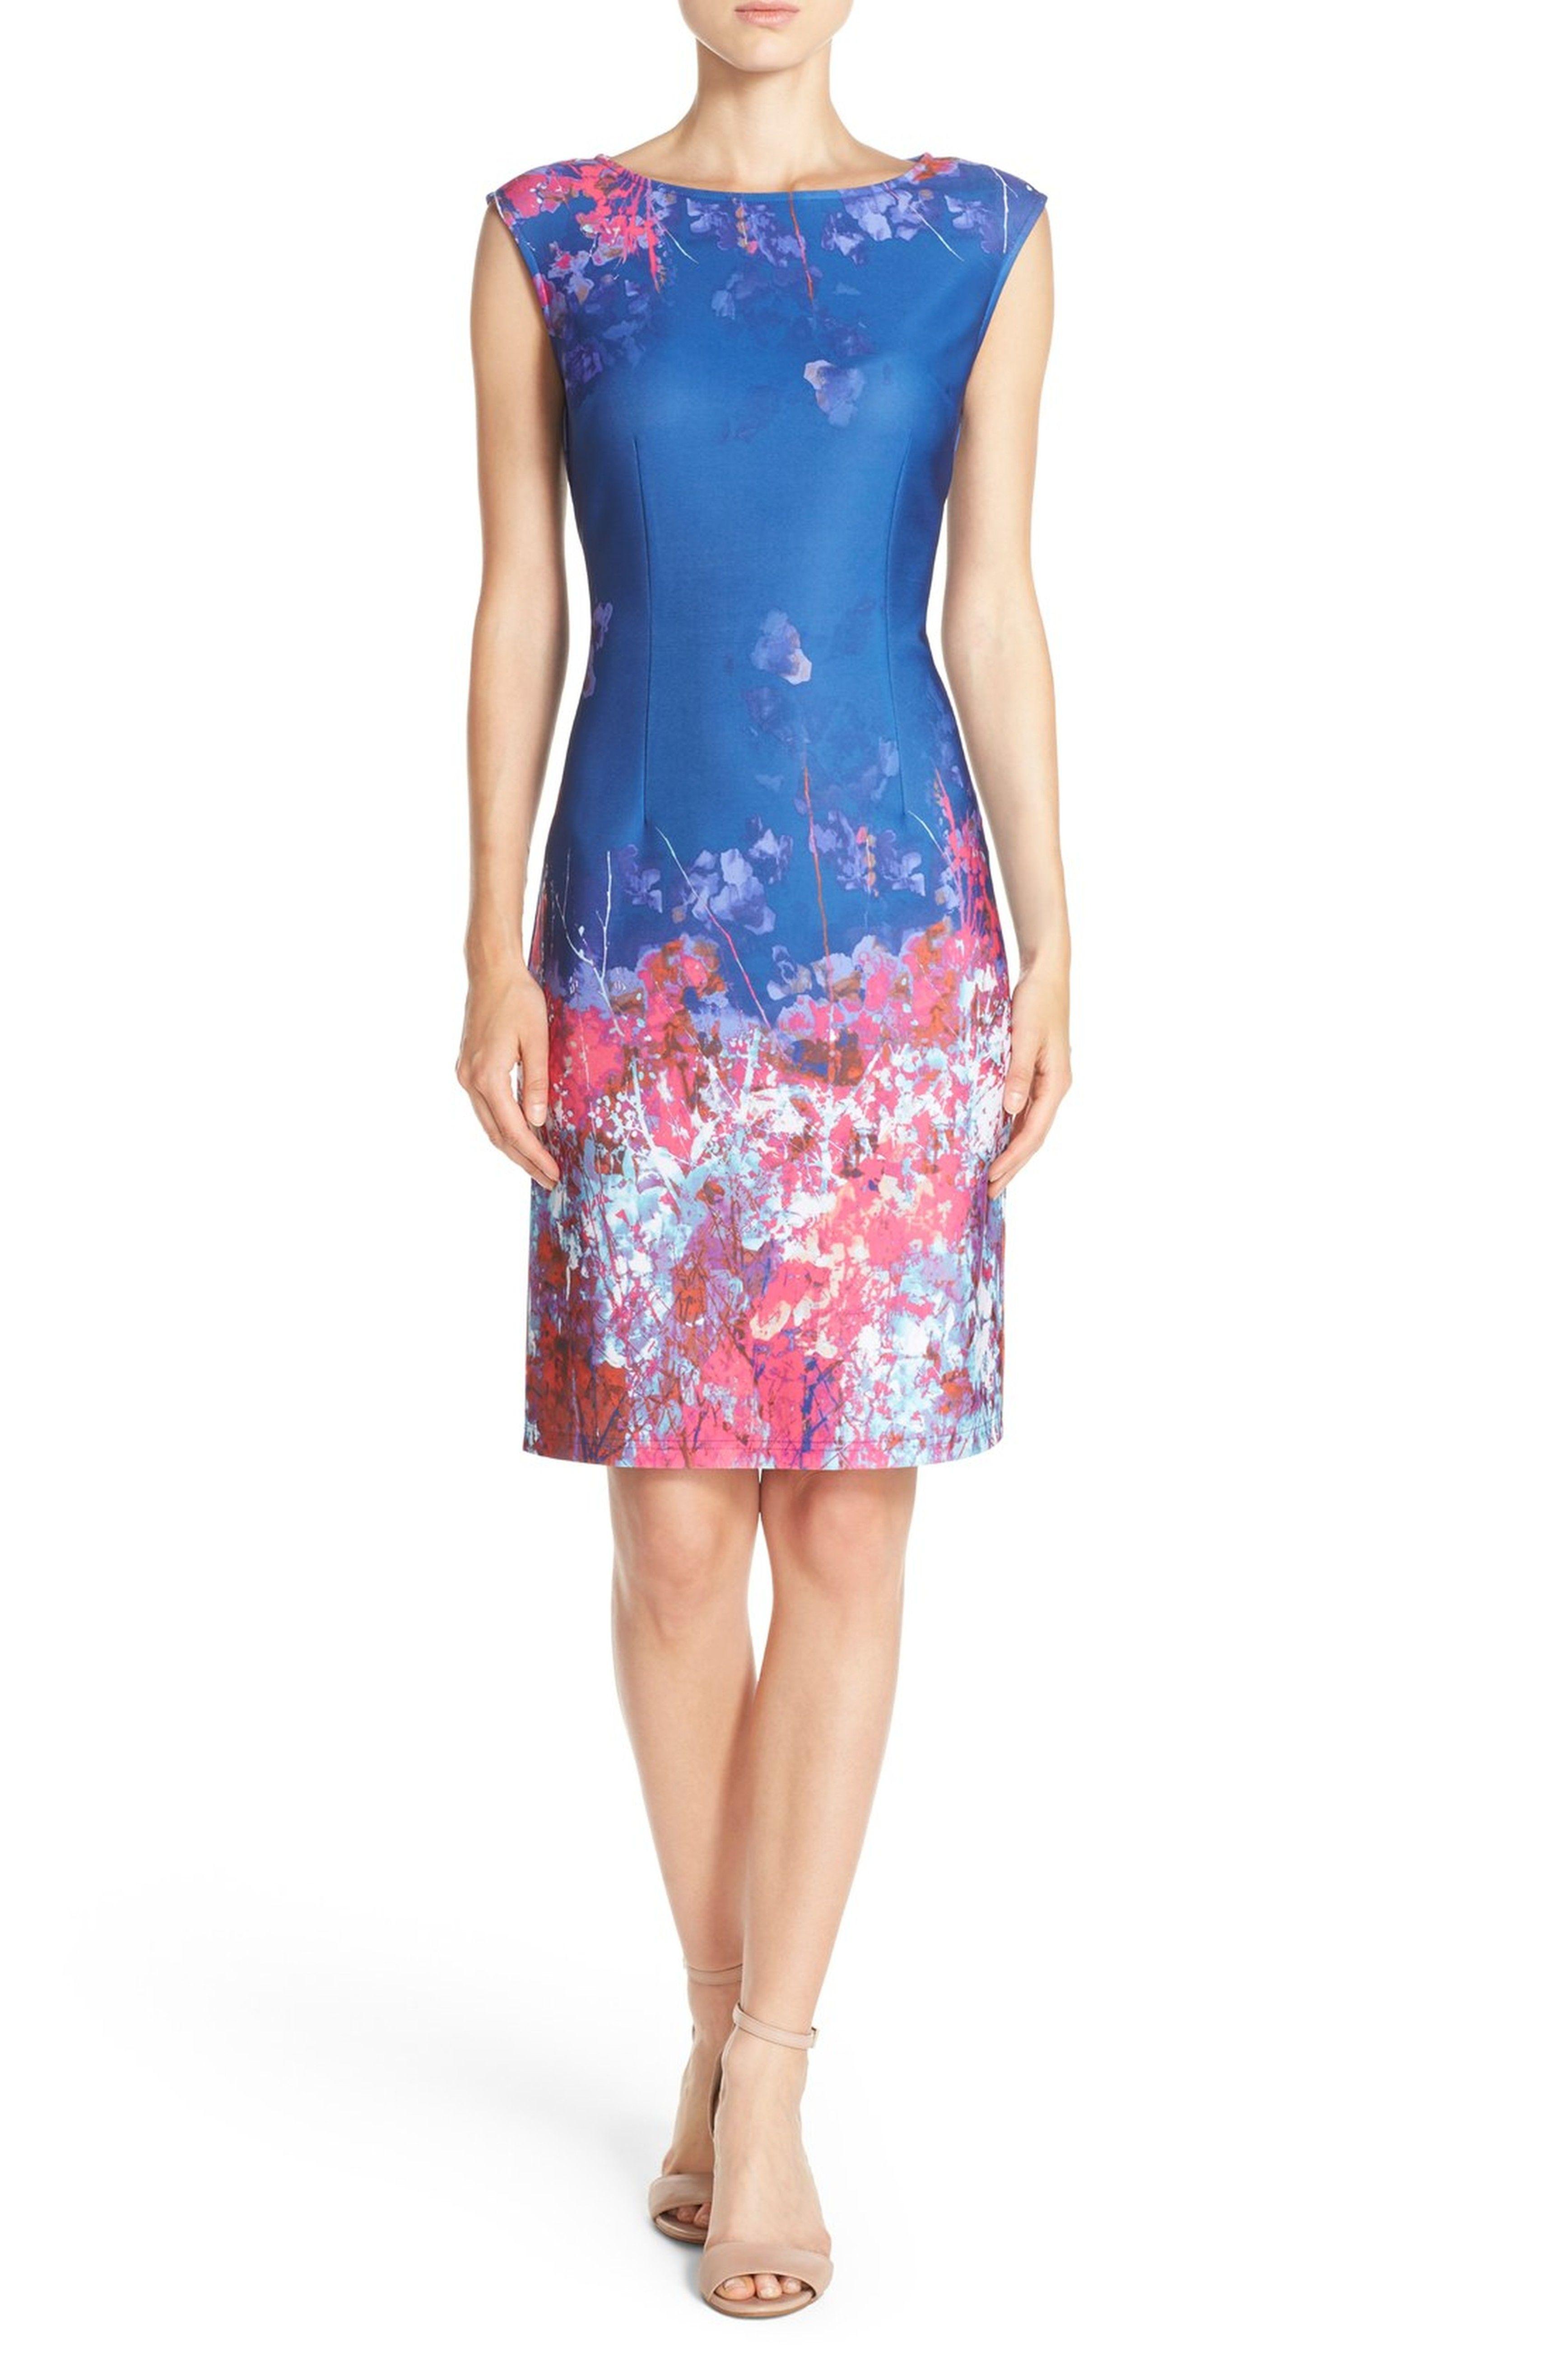 7f1a773729e Main Image - Adrianna Papell Floral Border Print Scuba Sheath Dress ...